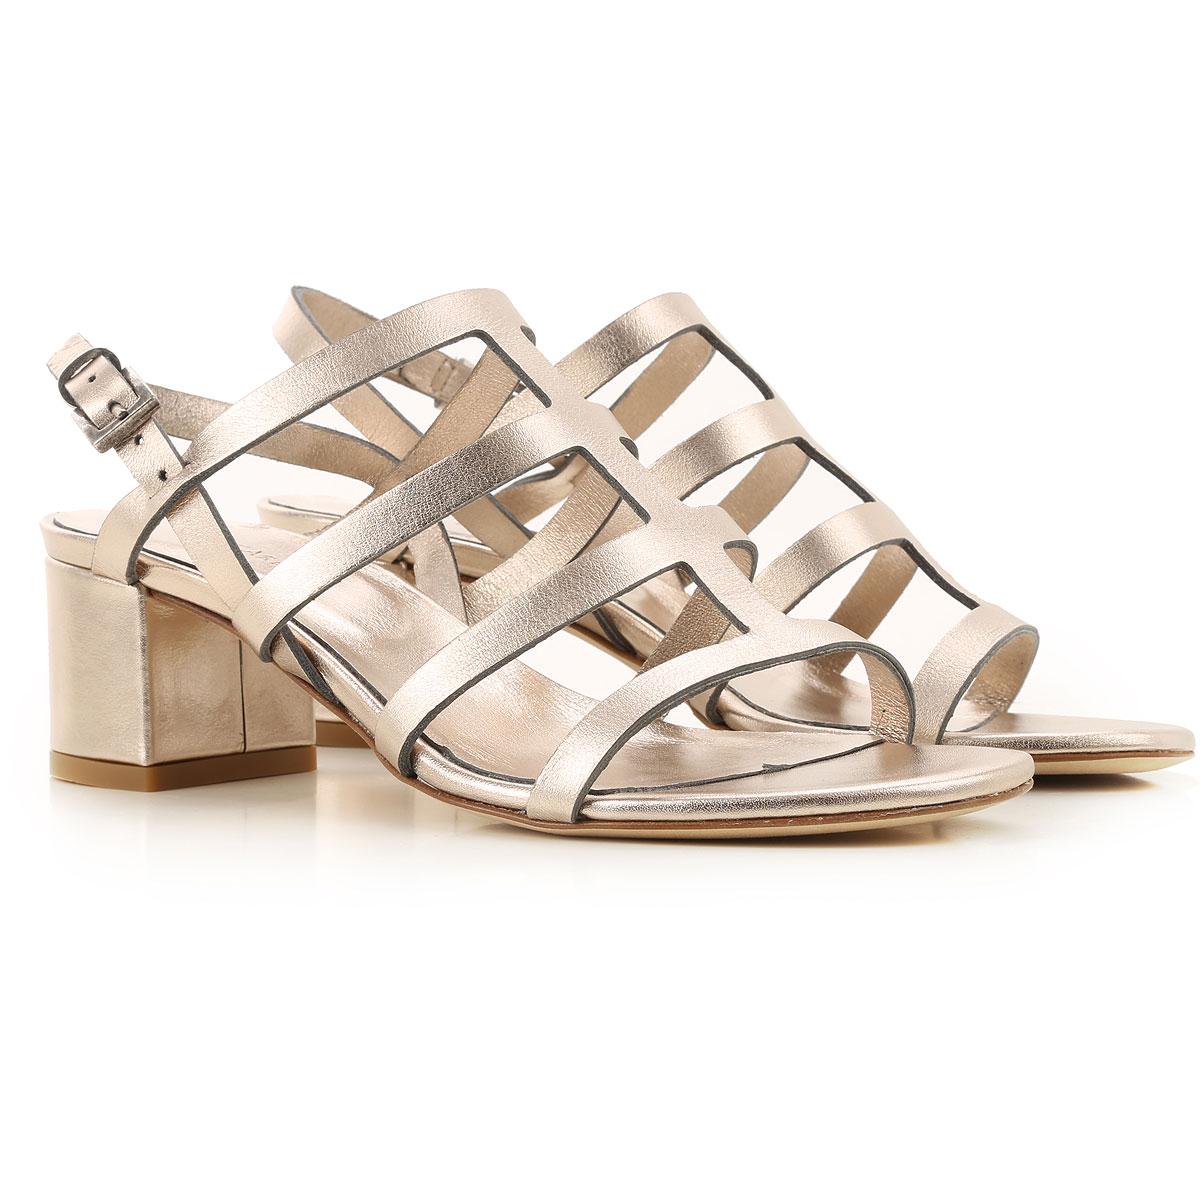 Roberto Del Carlo Sandals for Women On Sale, pirite, Metallic Leather, 2019, 6 7 8.5